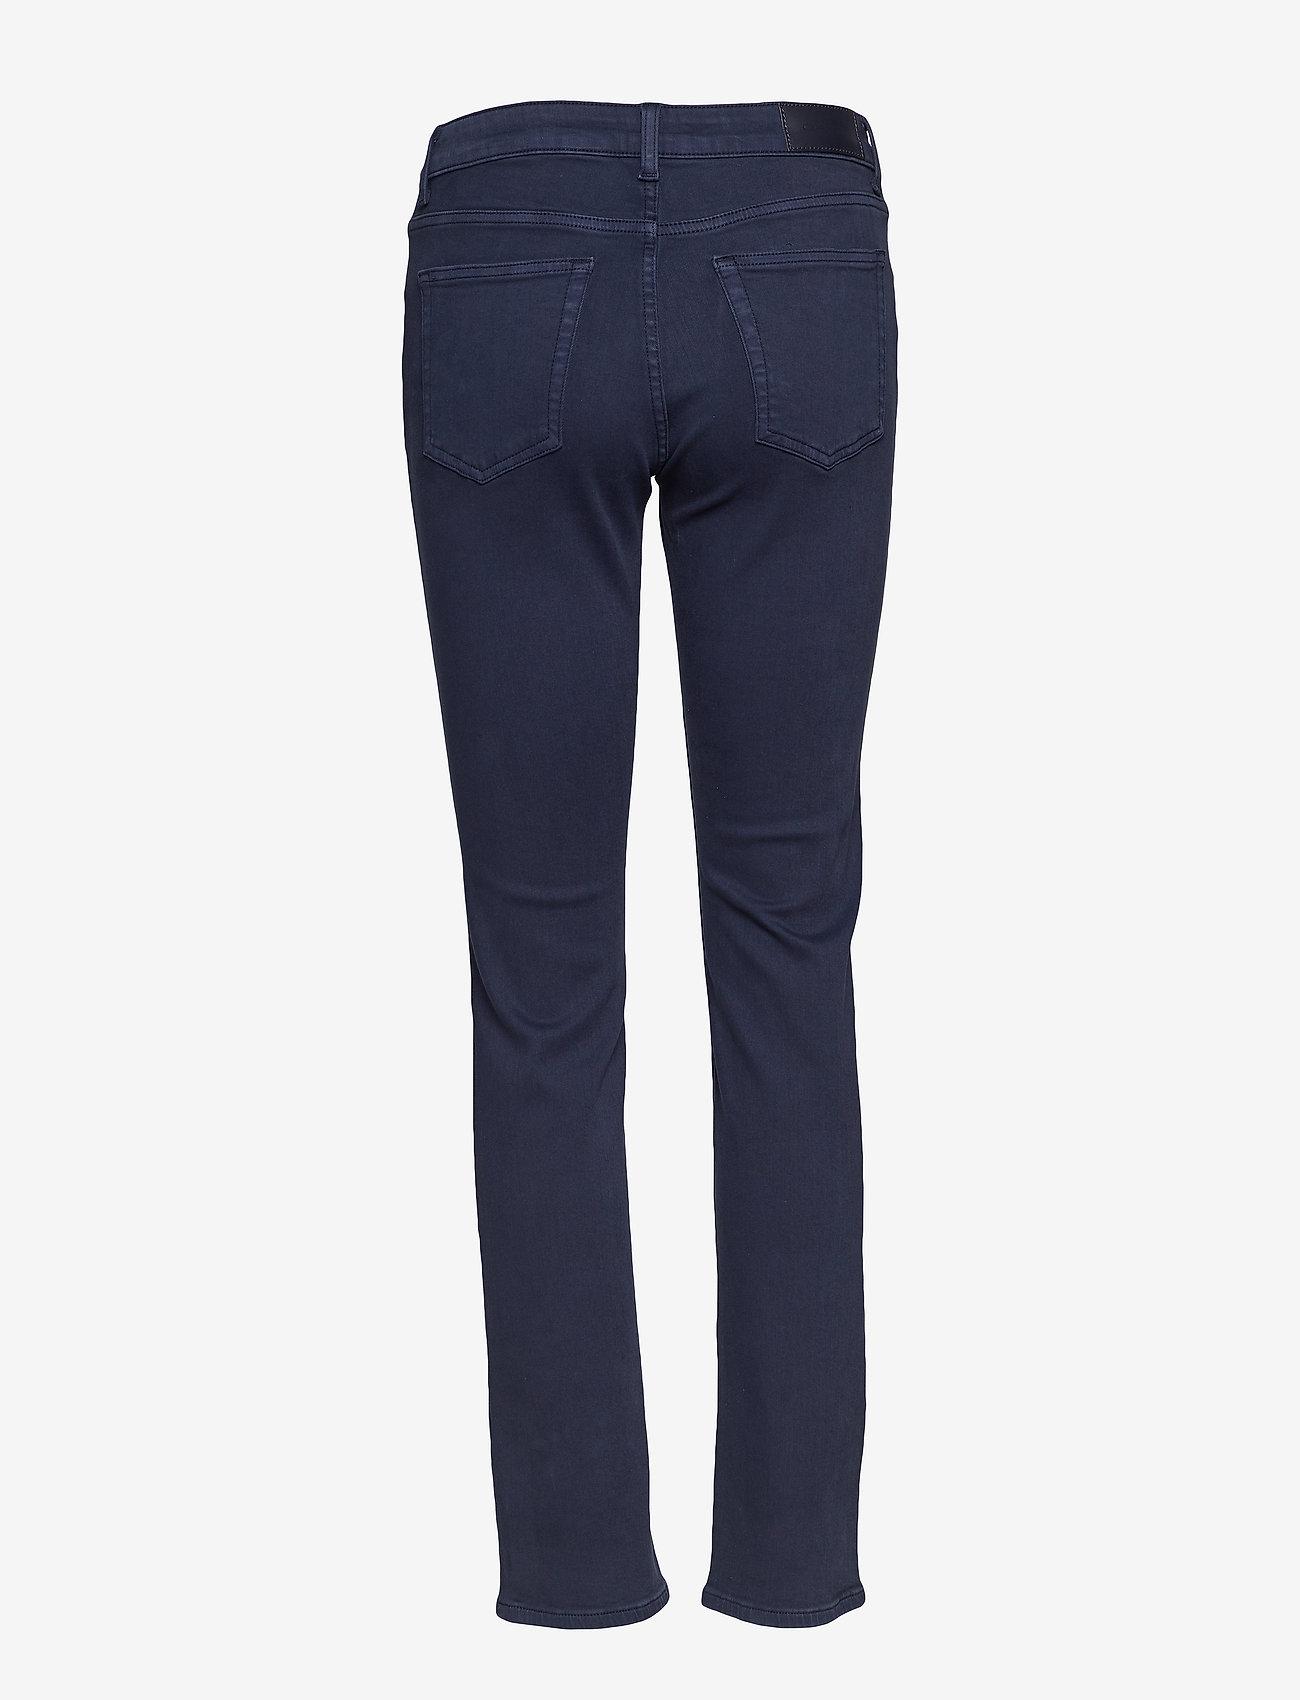 GANT - SLIM TWILL JEANS - slim jeans - marine - 1